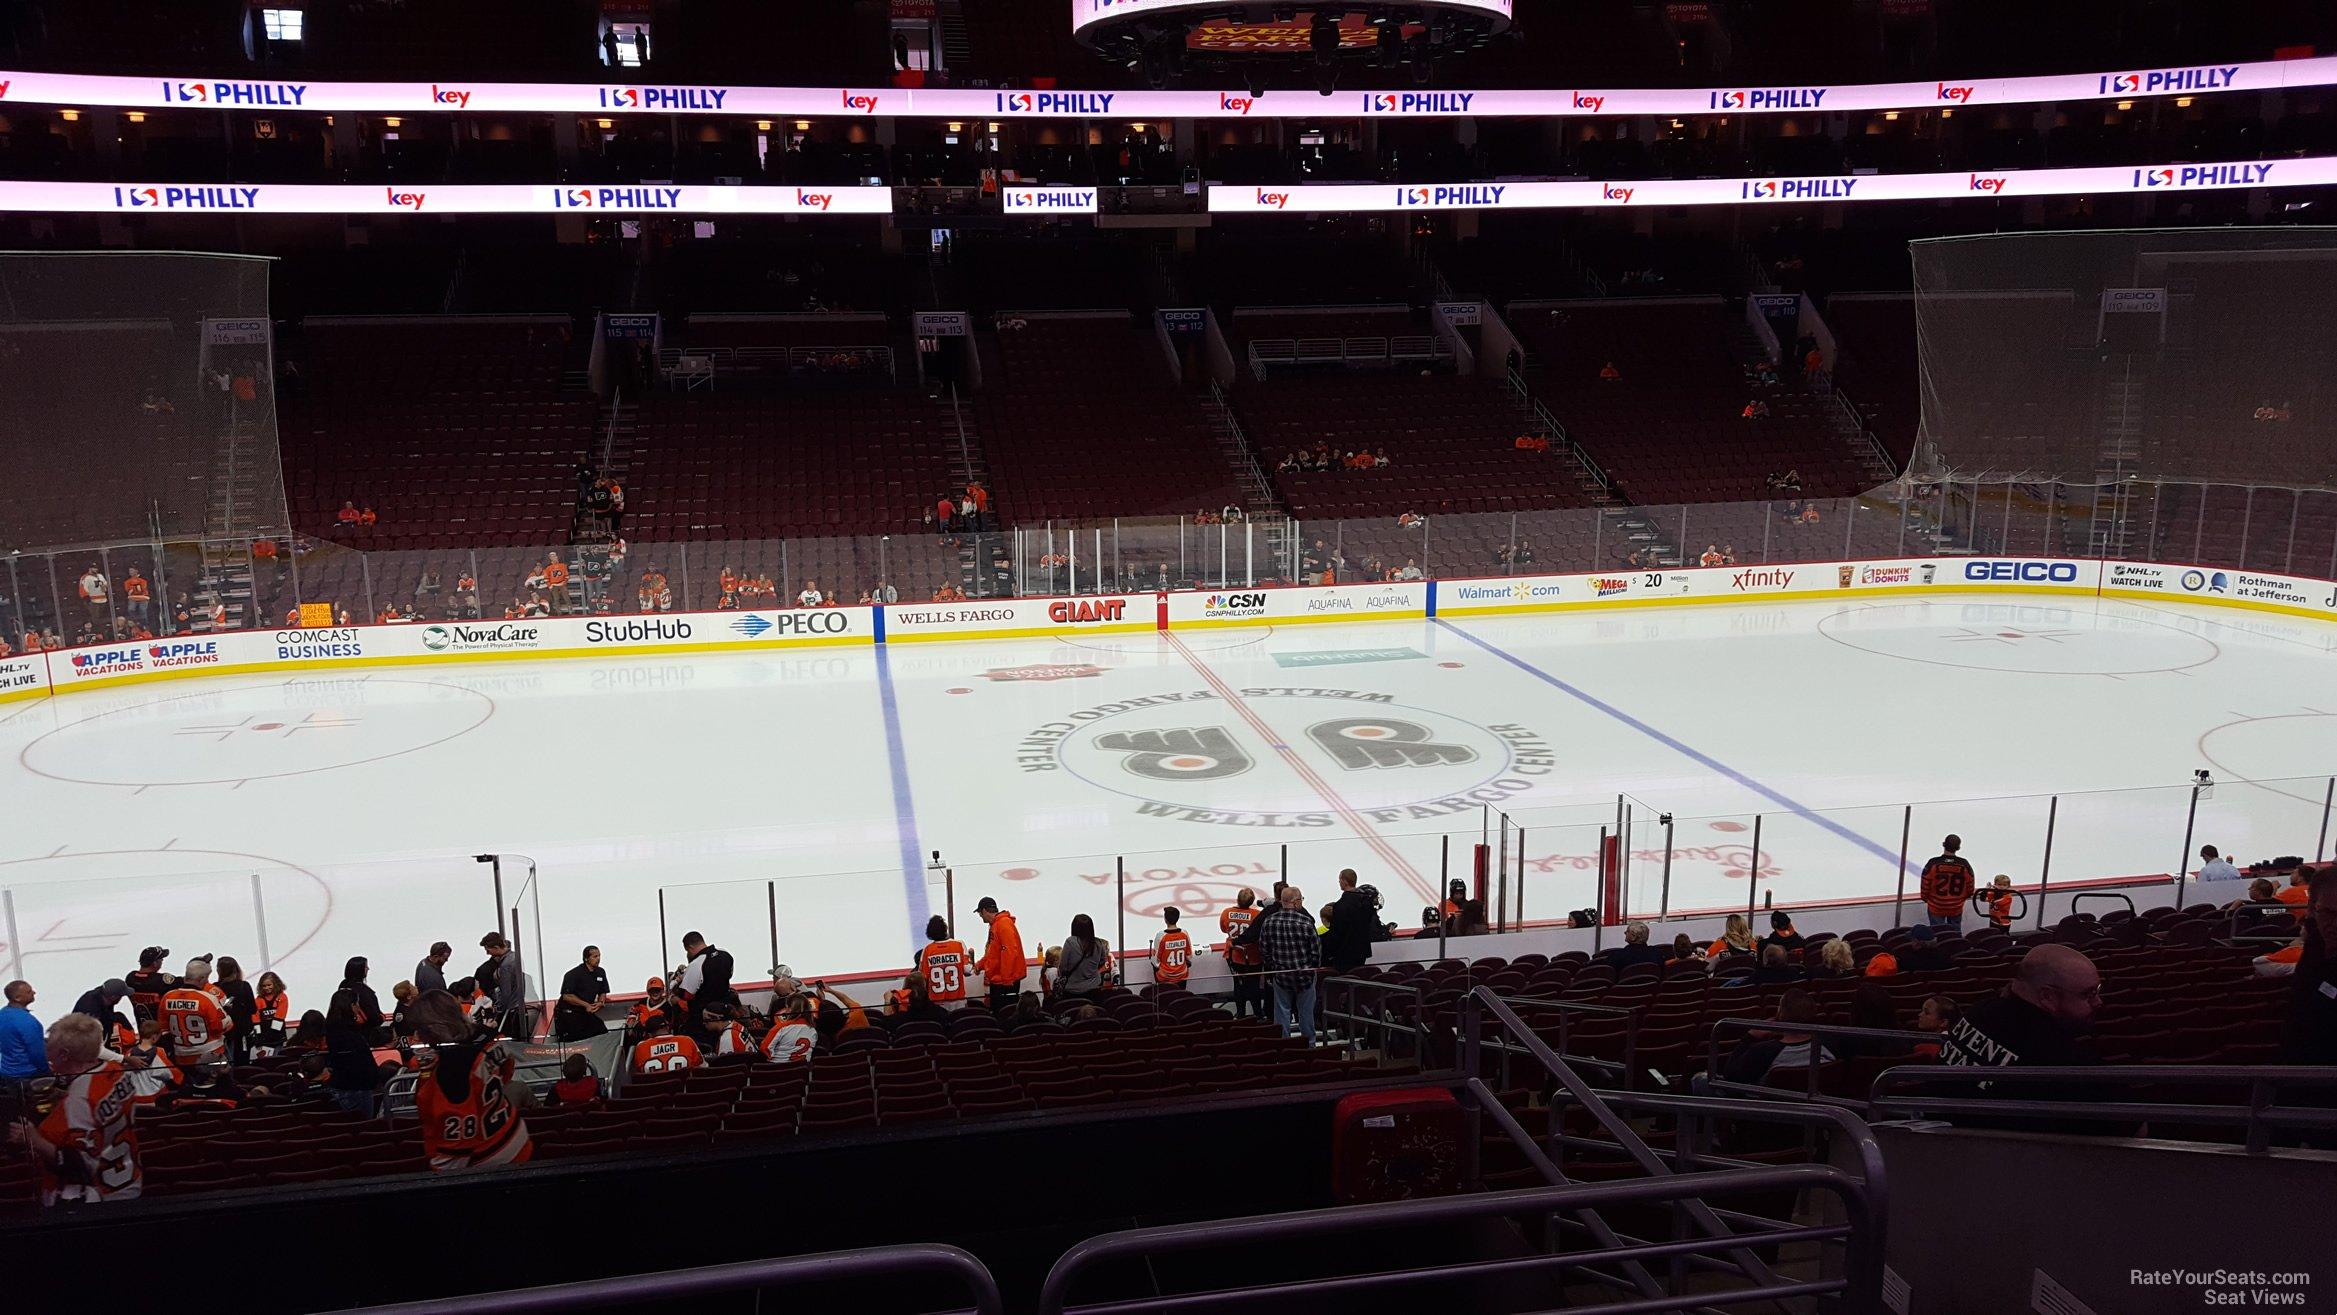 Club Box 24 seat view